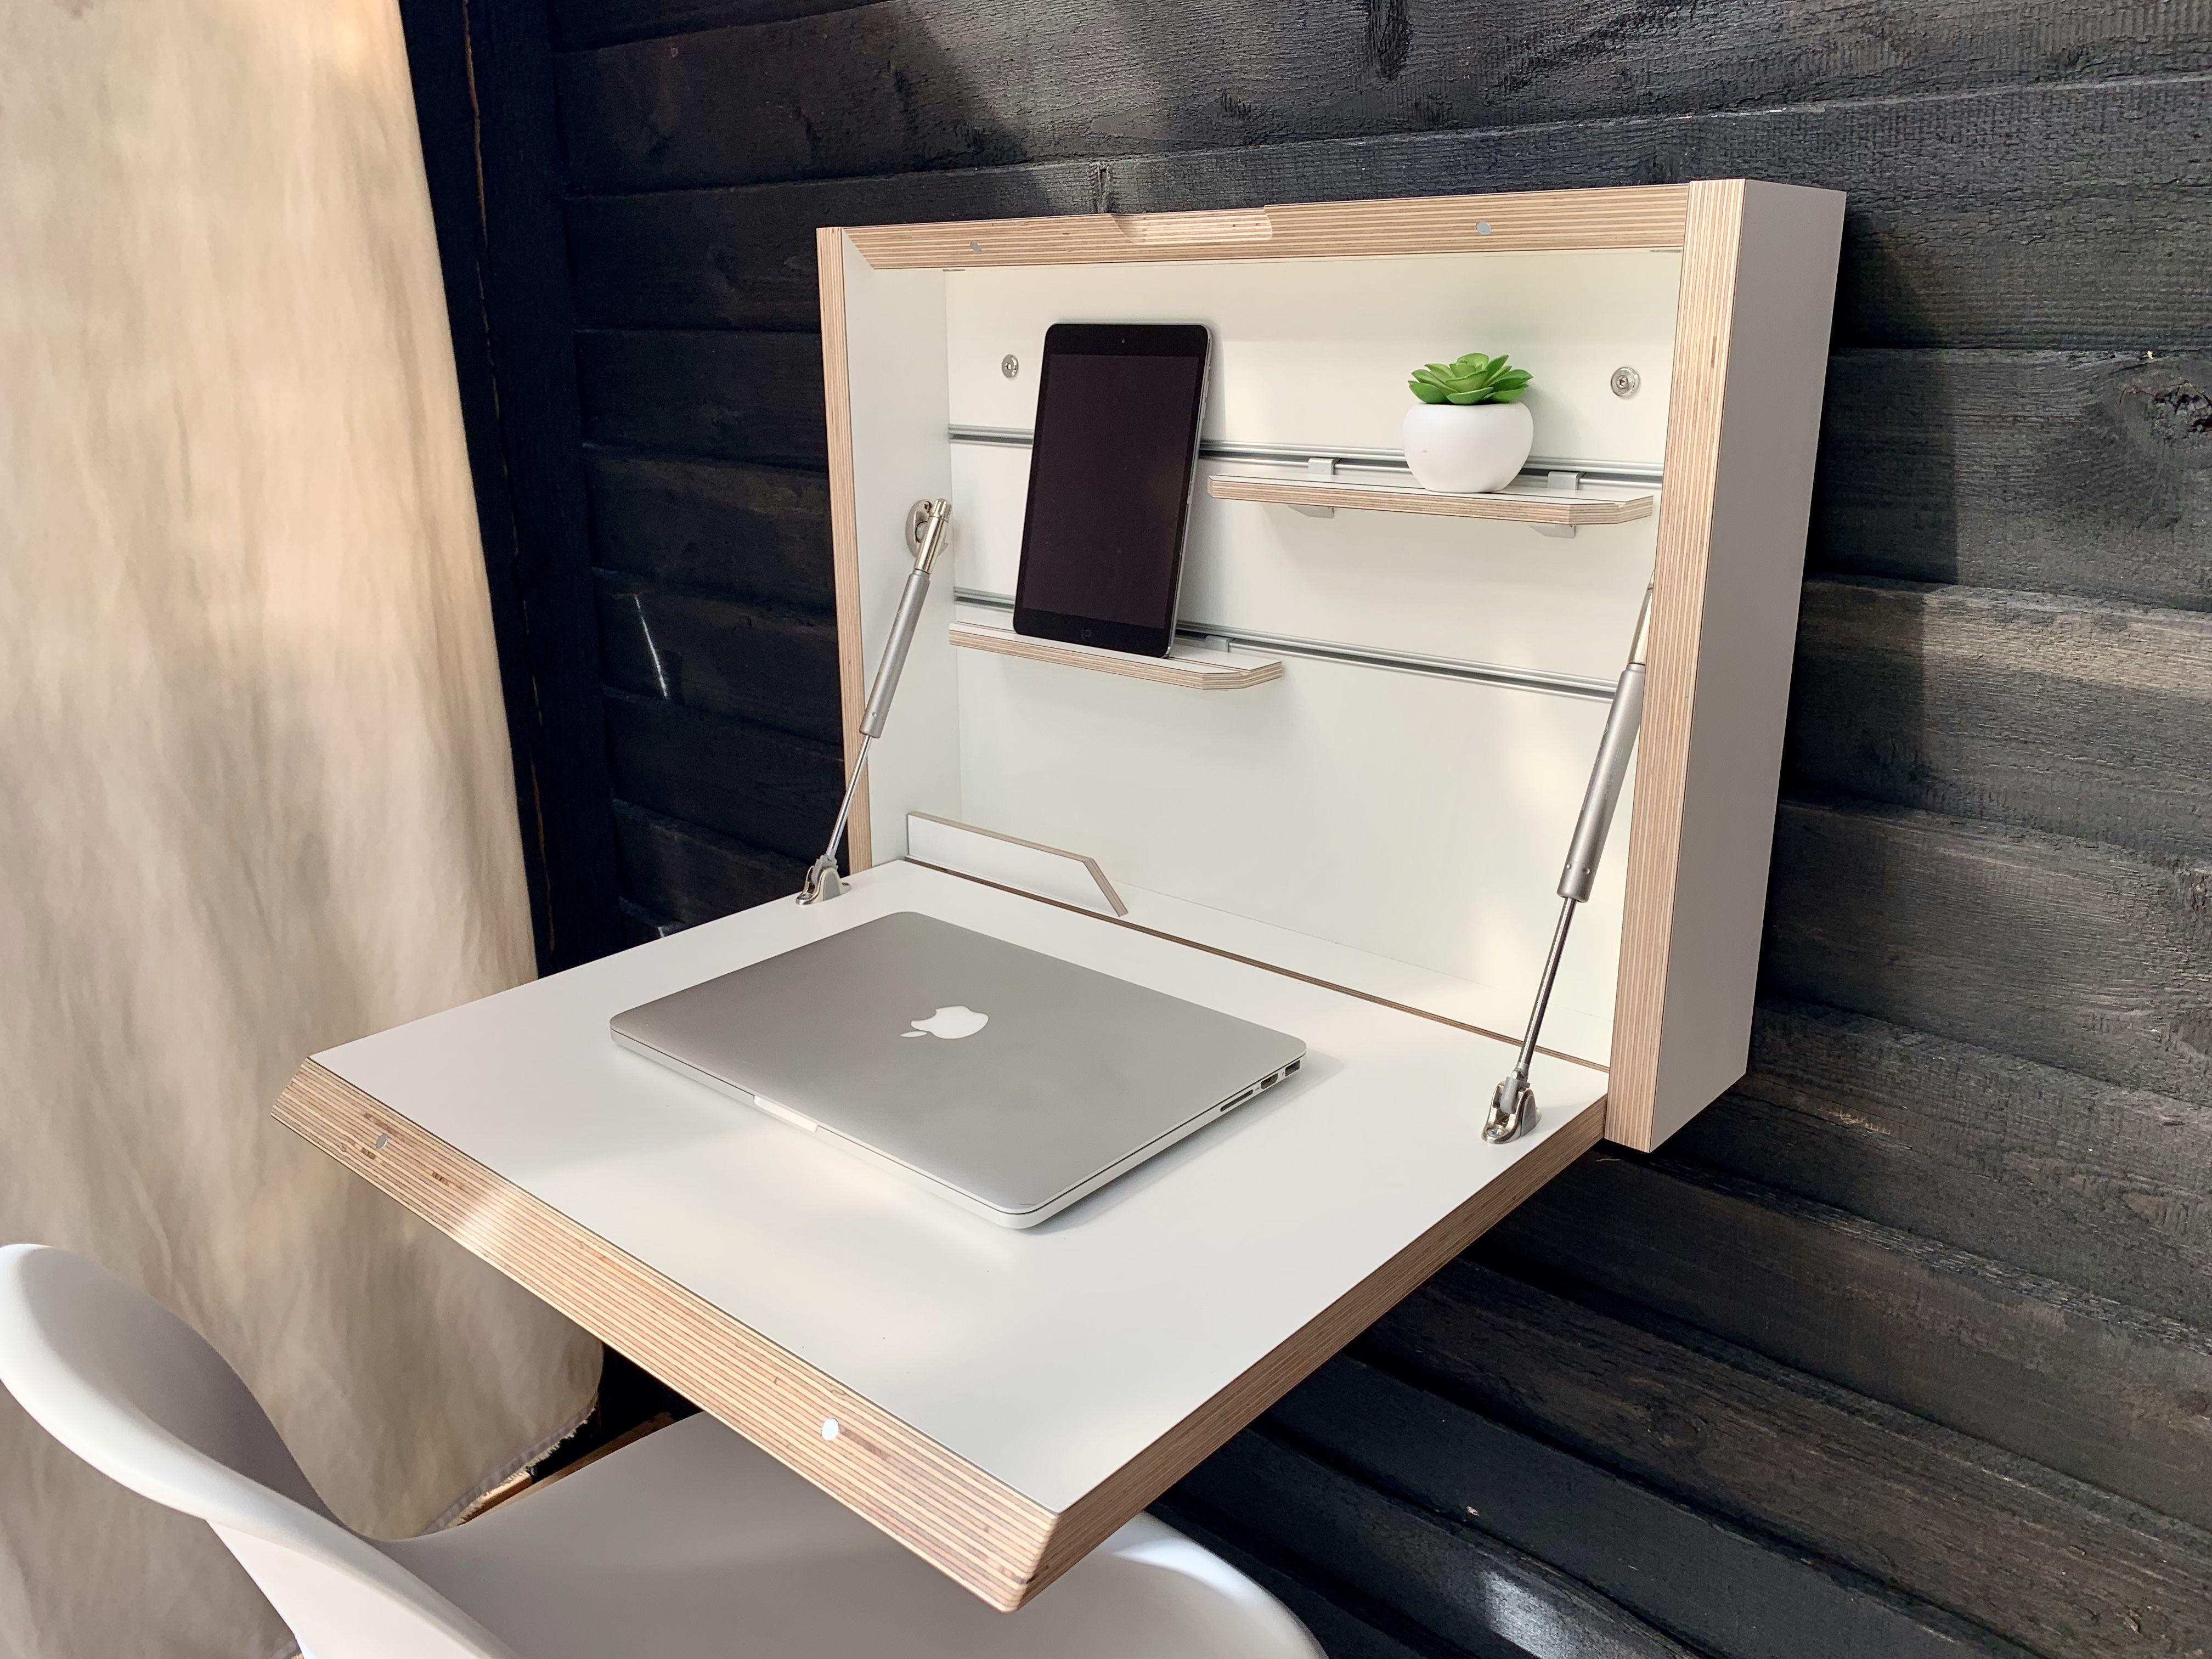 Small Folding Desk Space Saving Desk Office Desk Secretary Desk